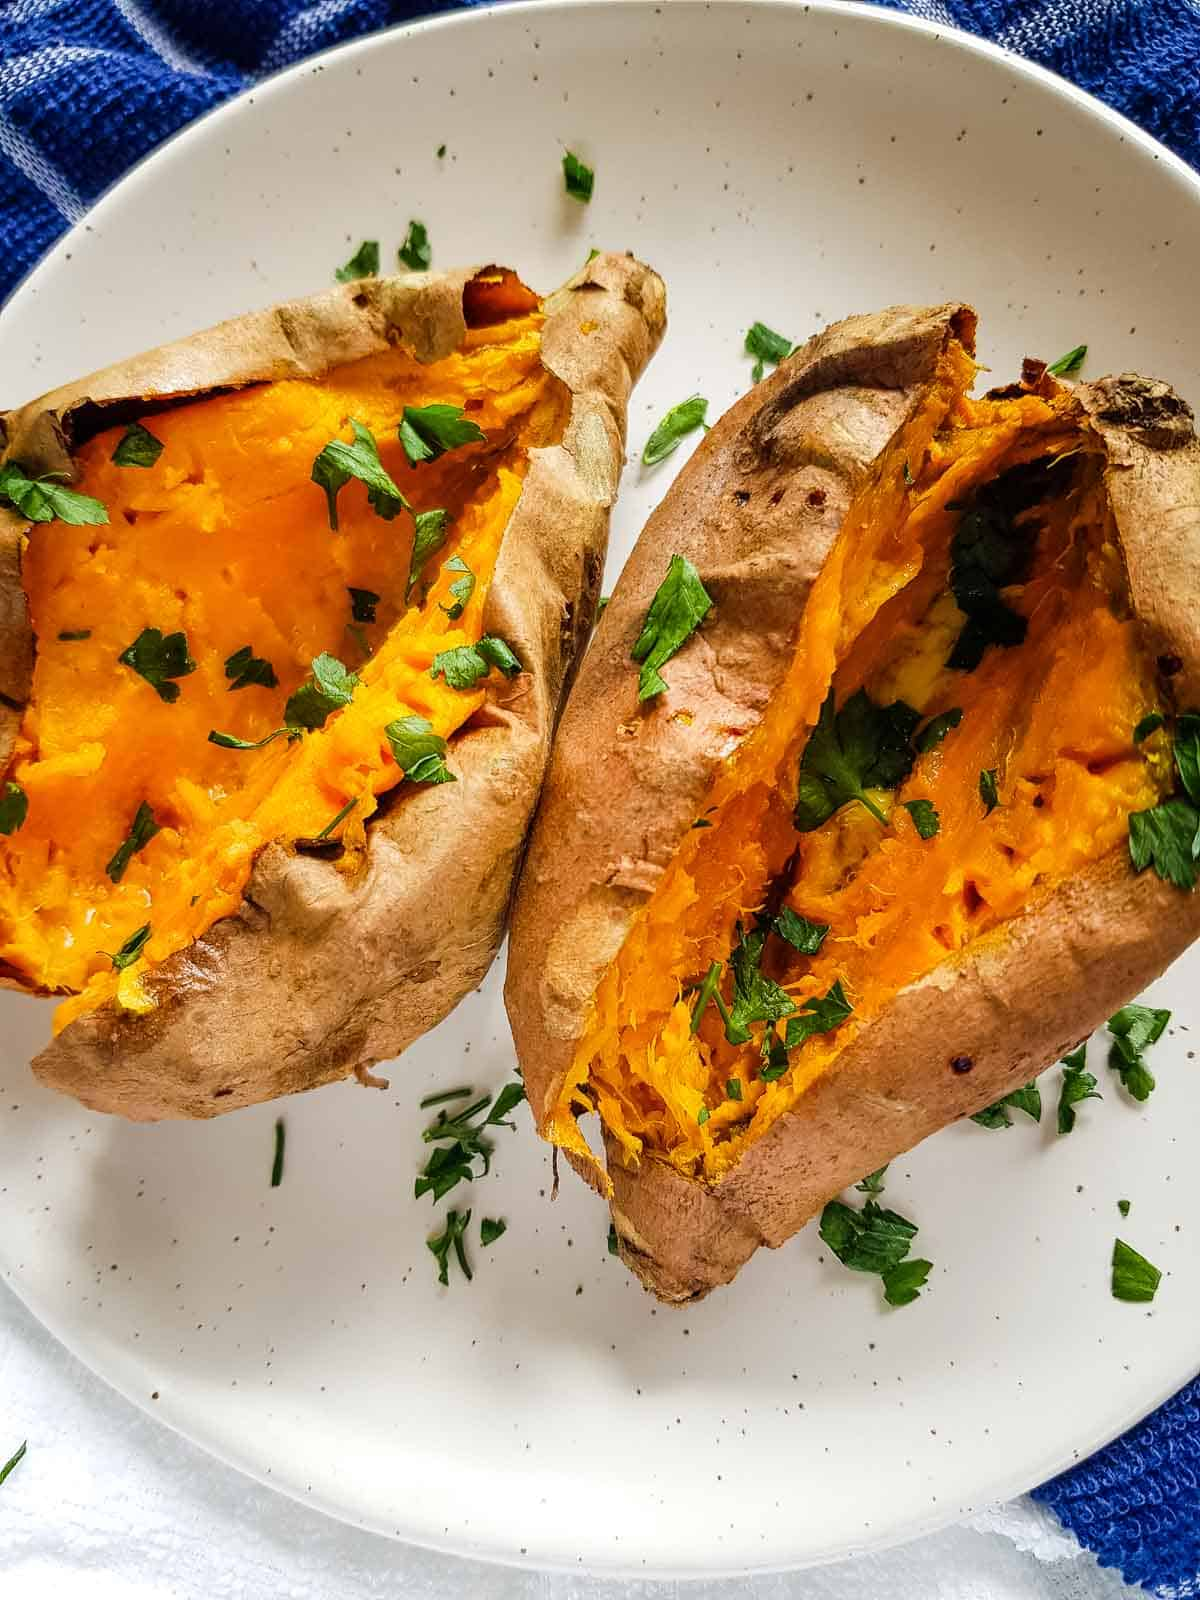 Air fryer baked sweet potatoes.